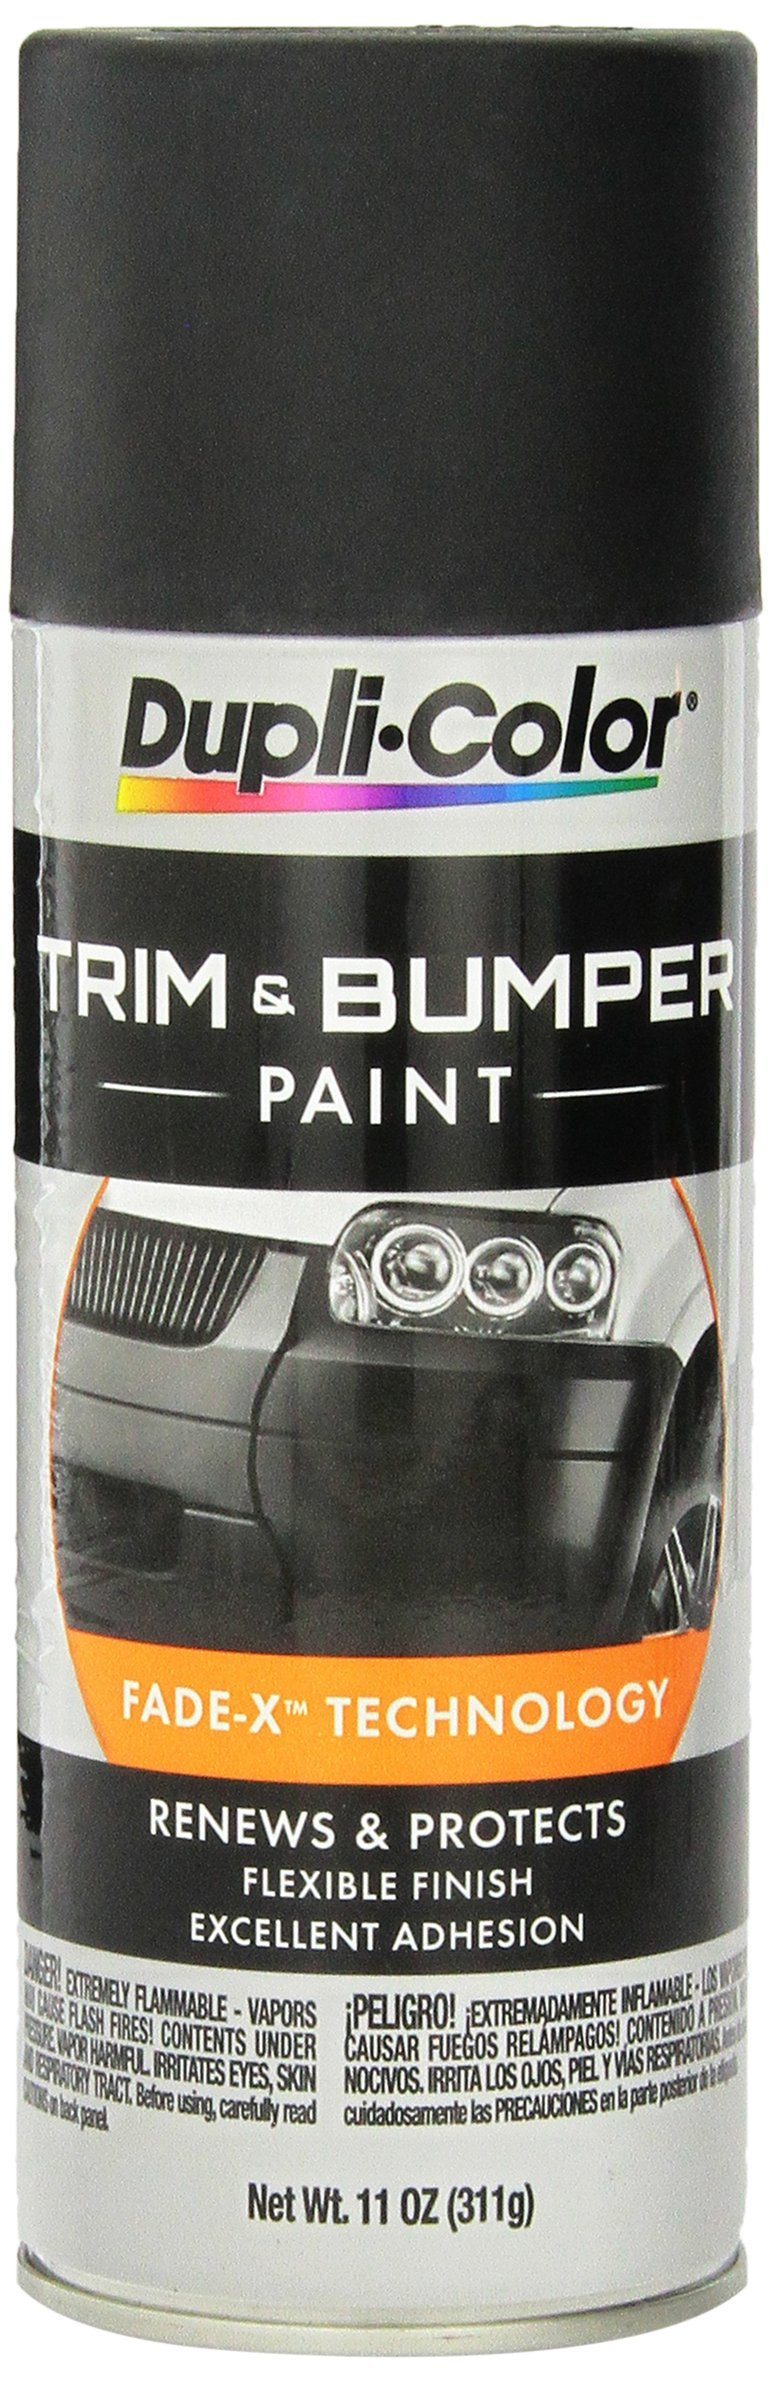 Dupli-Color TB101 Trim and Bumper Paint - 11 fl. oz.